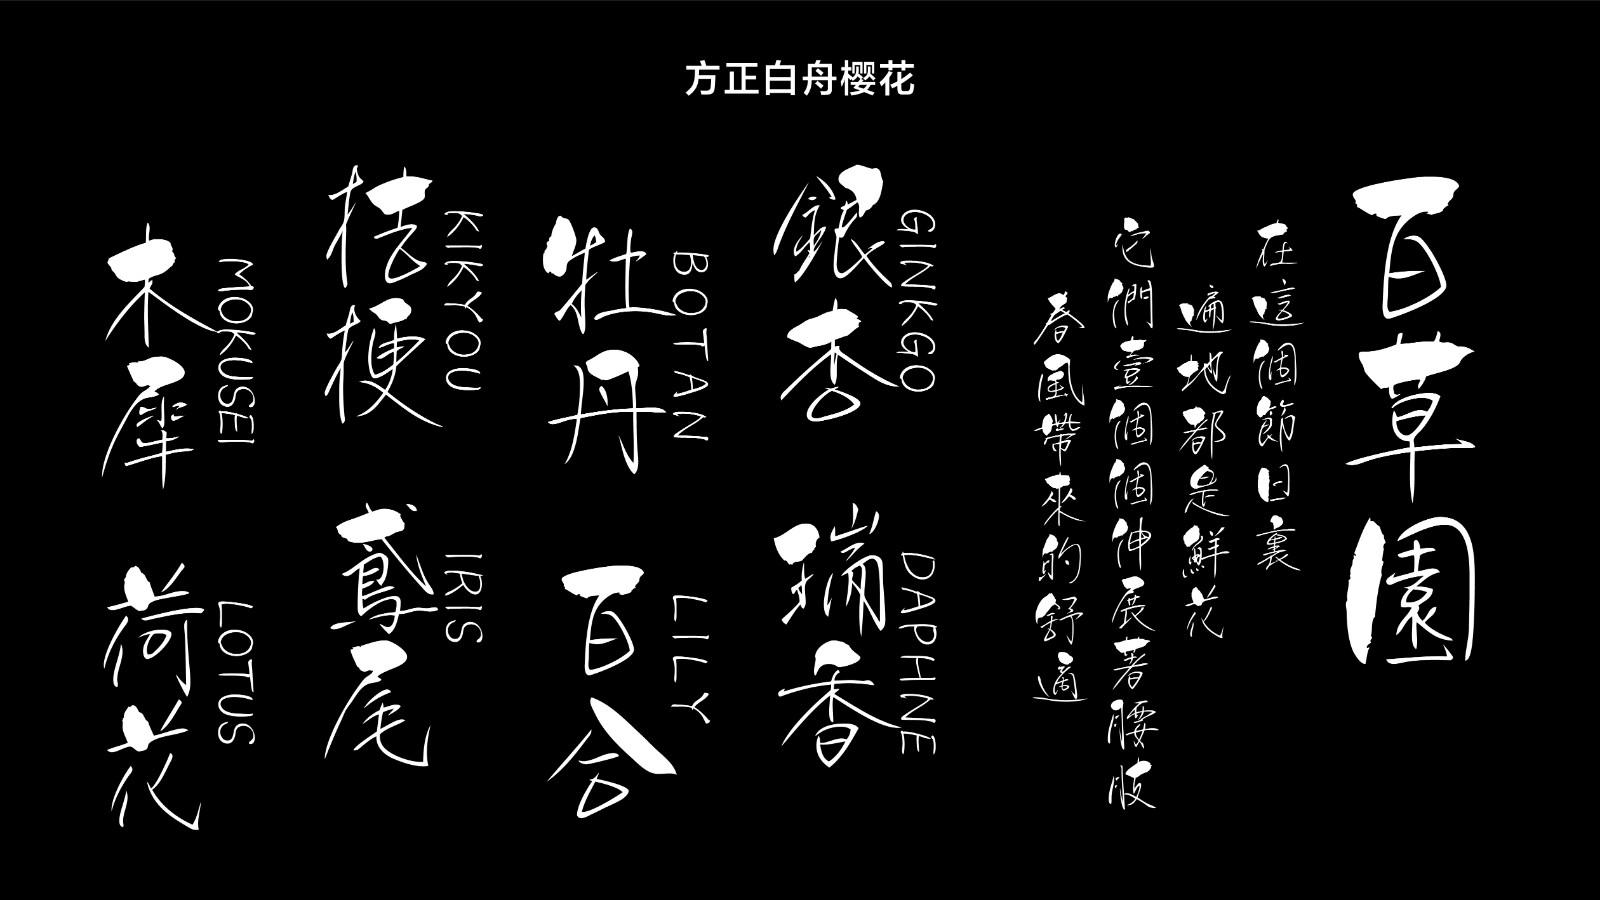 https://ft-bk1.oss-cn-zhangjiakou.aliyuncs.com/Public/Uploads/img/n_content_20201210180159_9498.jpg